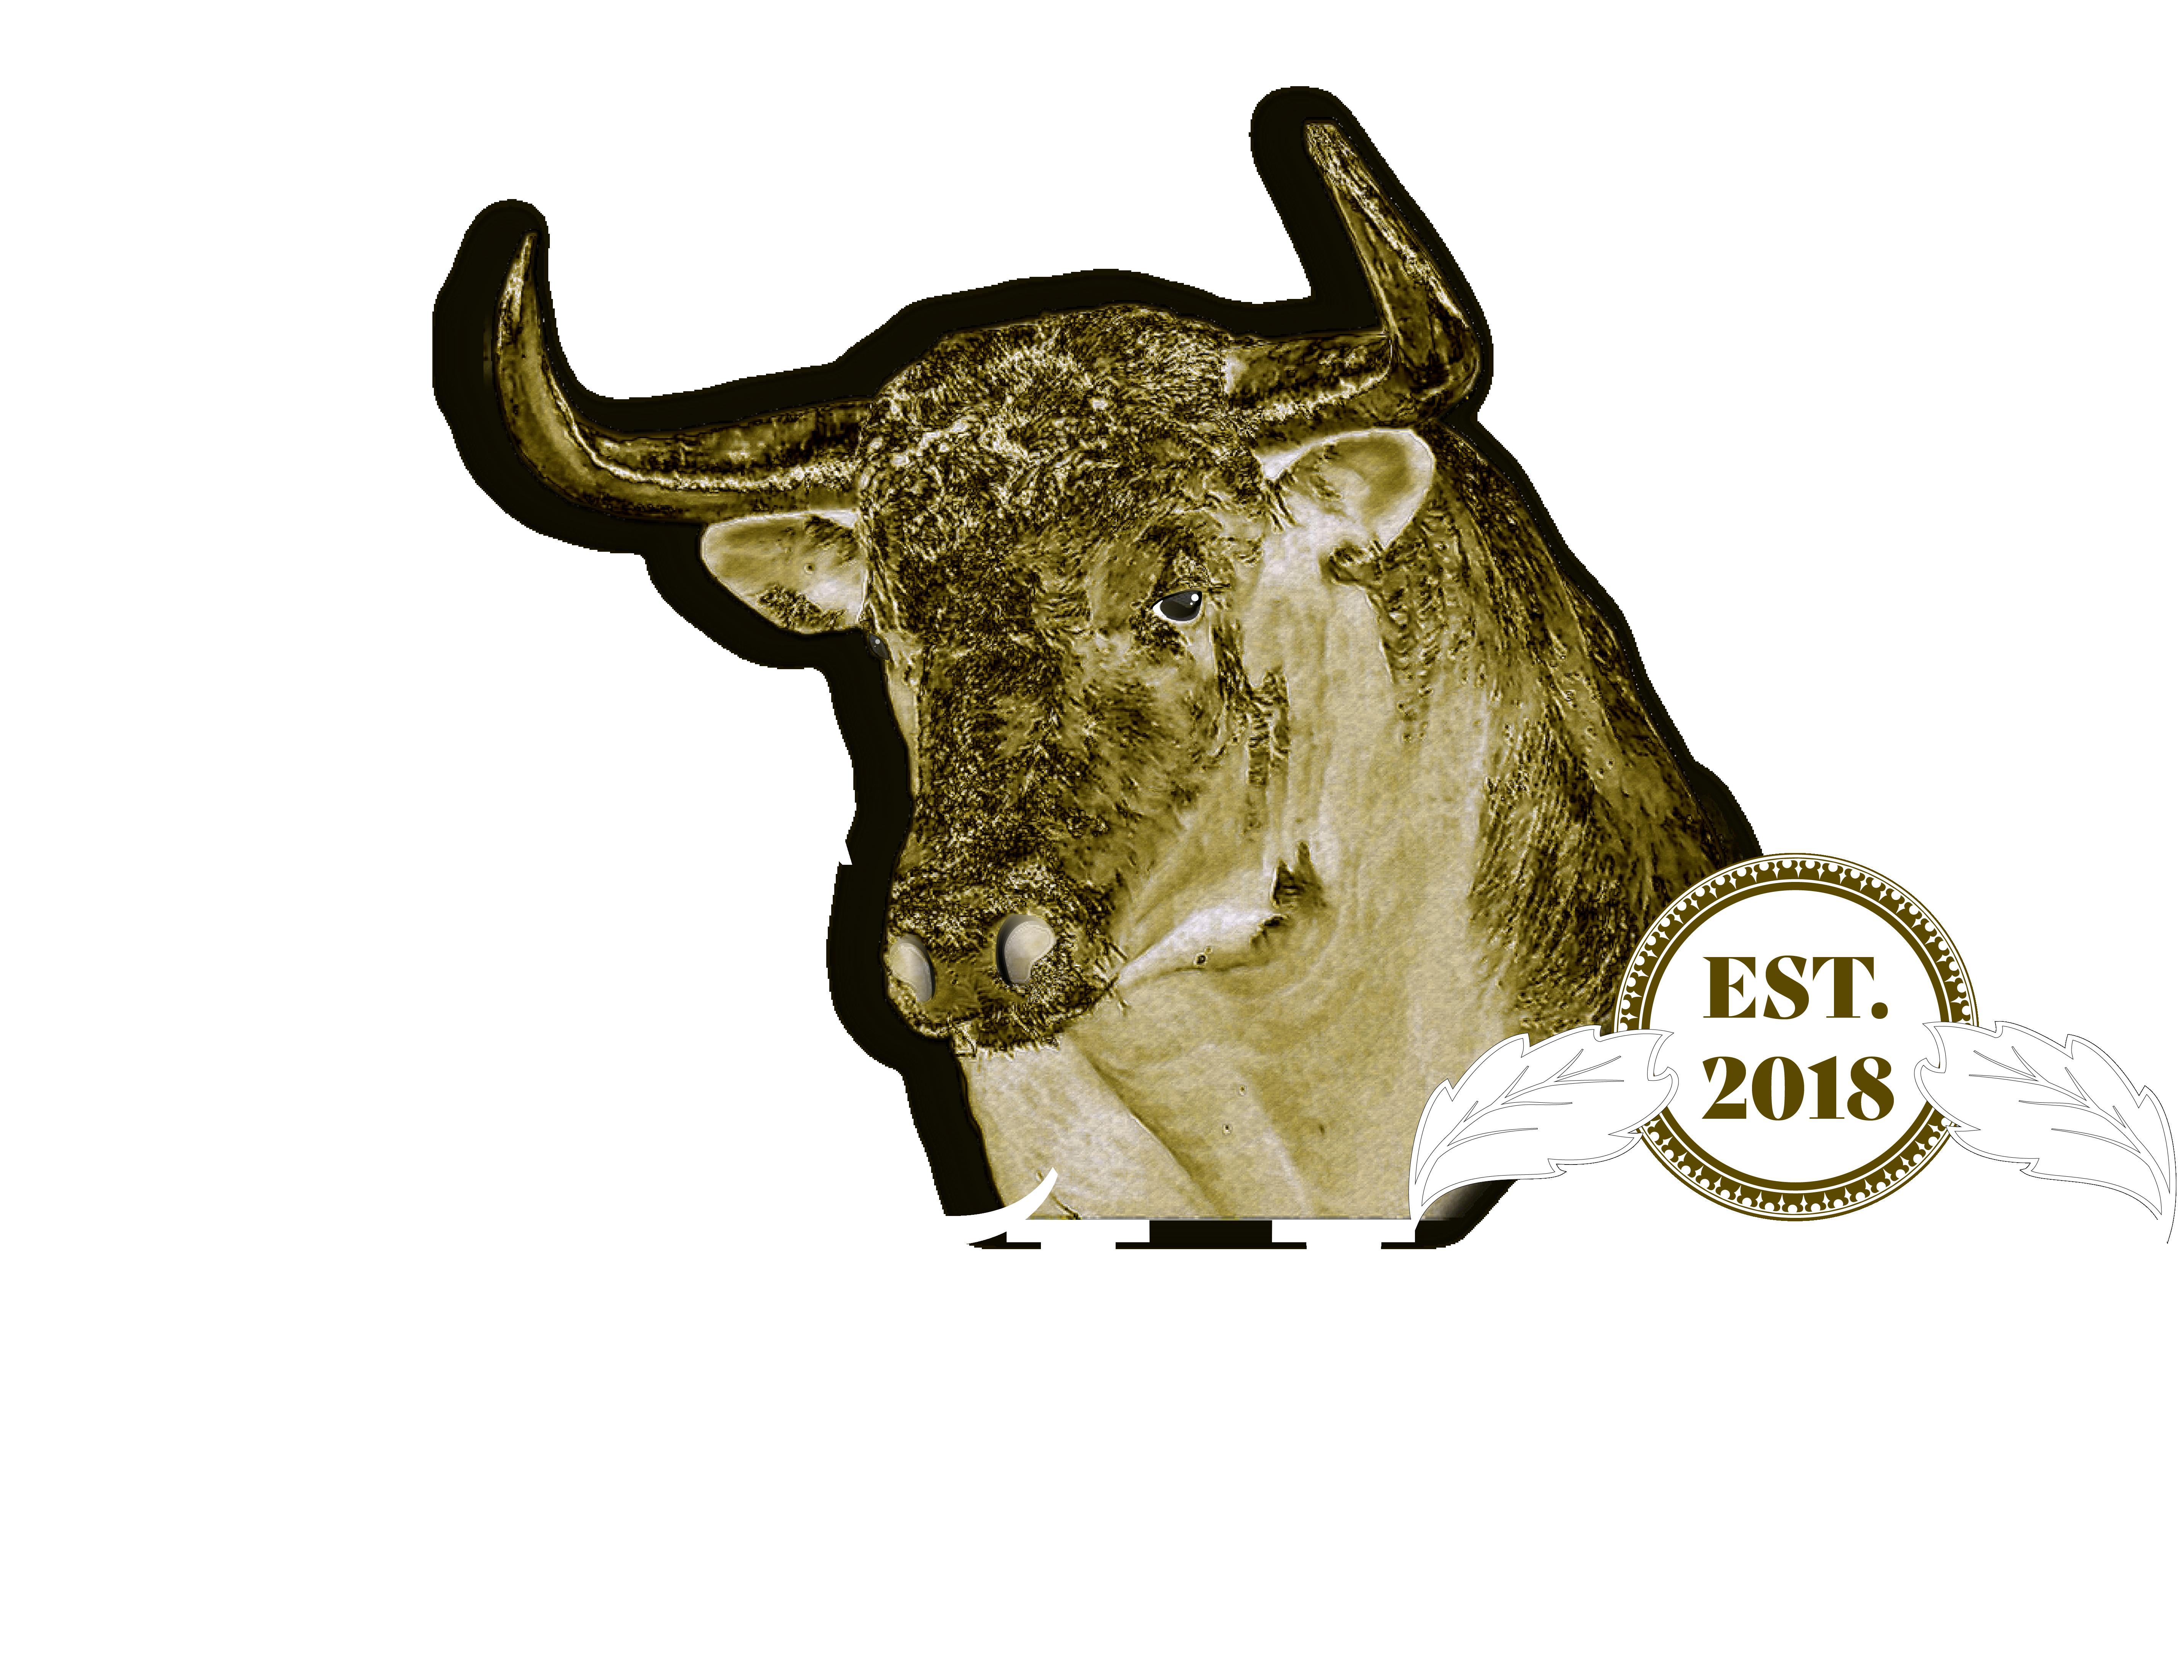 OneBullion.com